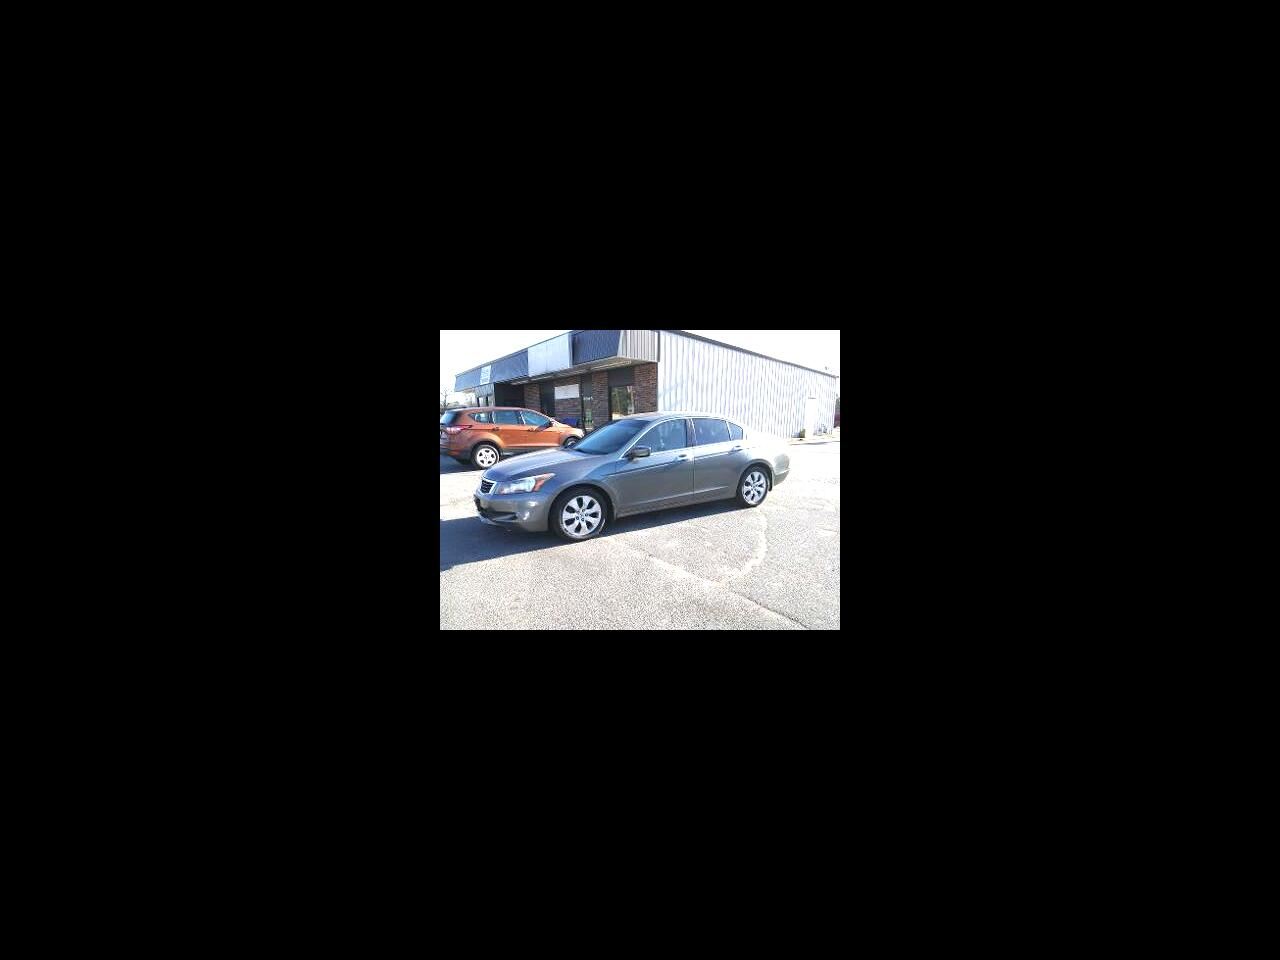 Honda Accord Sdn 4dr V6 Auto EX-L 2008